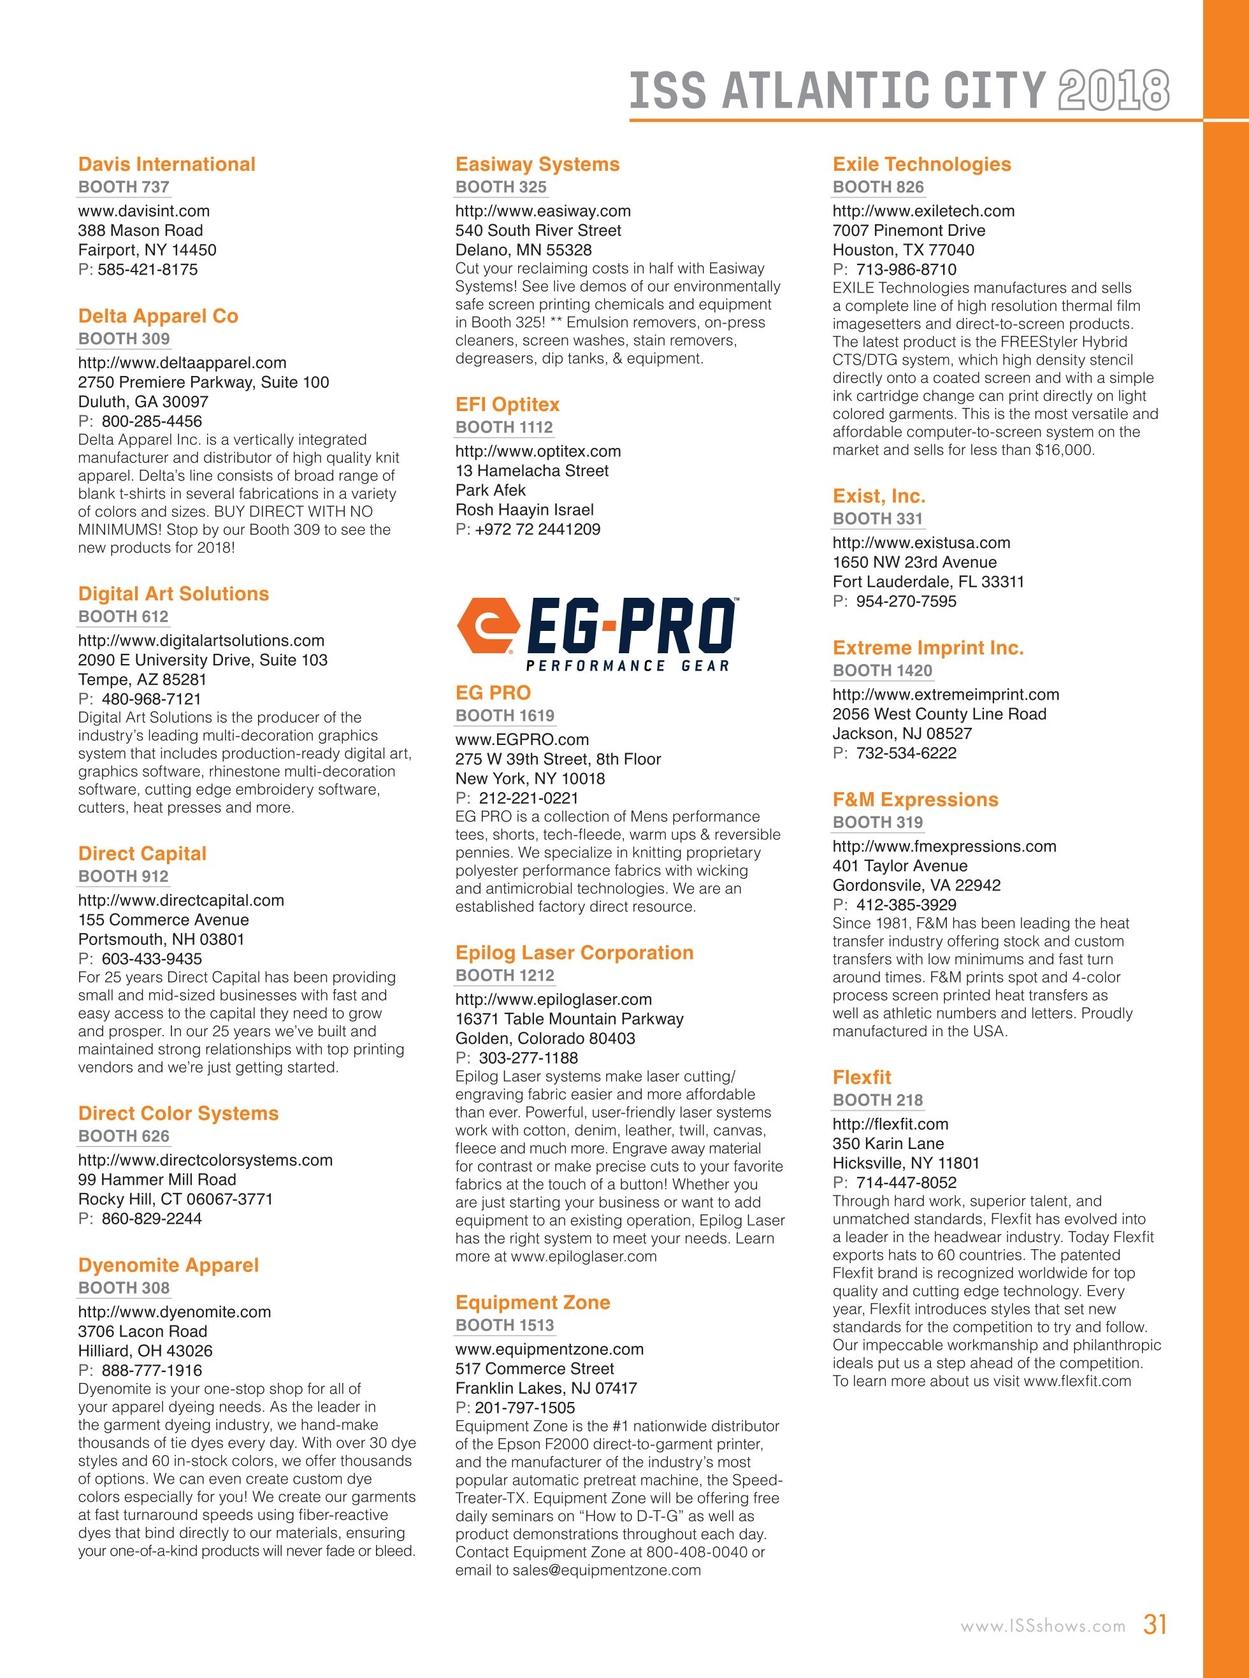 Iss Atlantic City Show Directory 2018